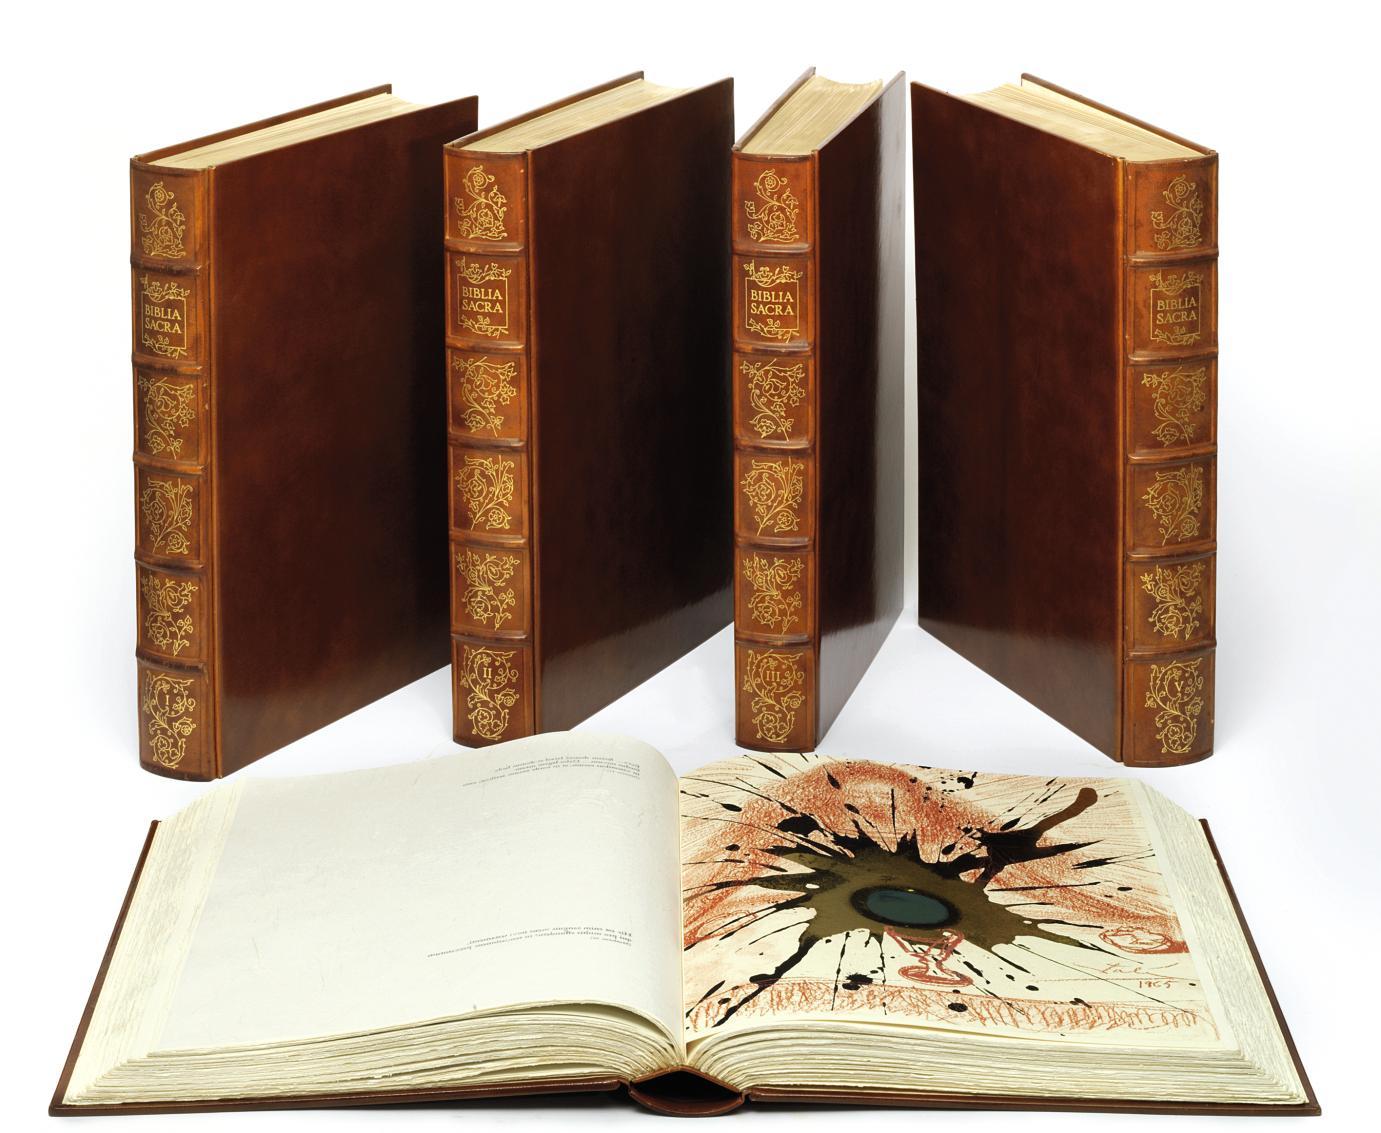 Biblia Sacra Vulgatae Editionis – Rizzoli Editore